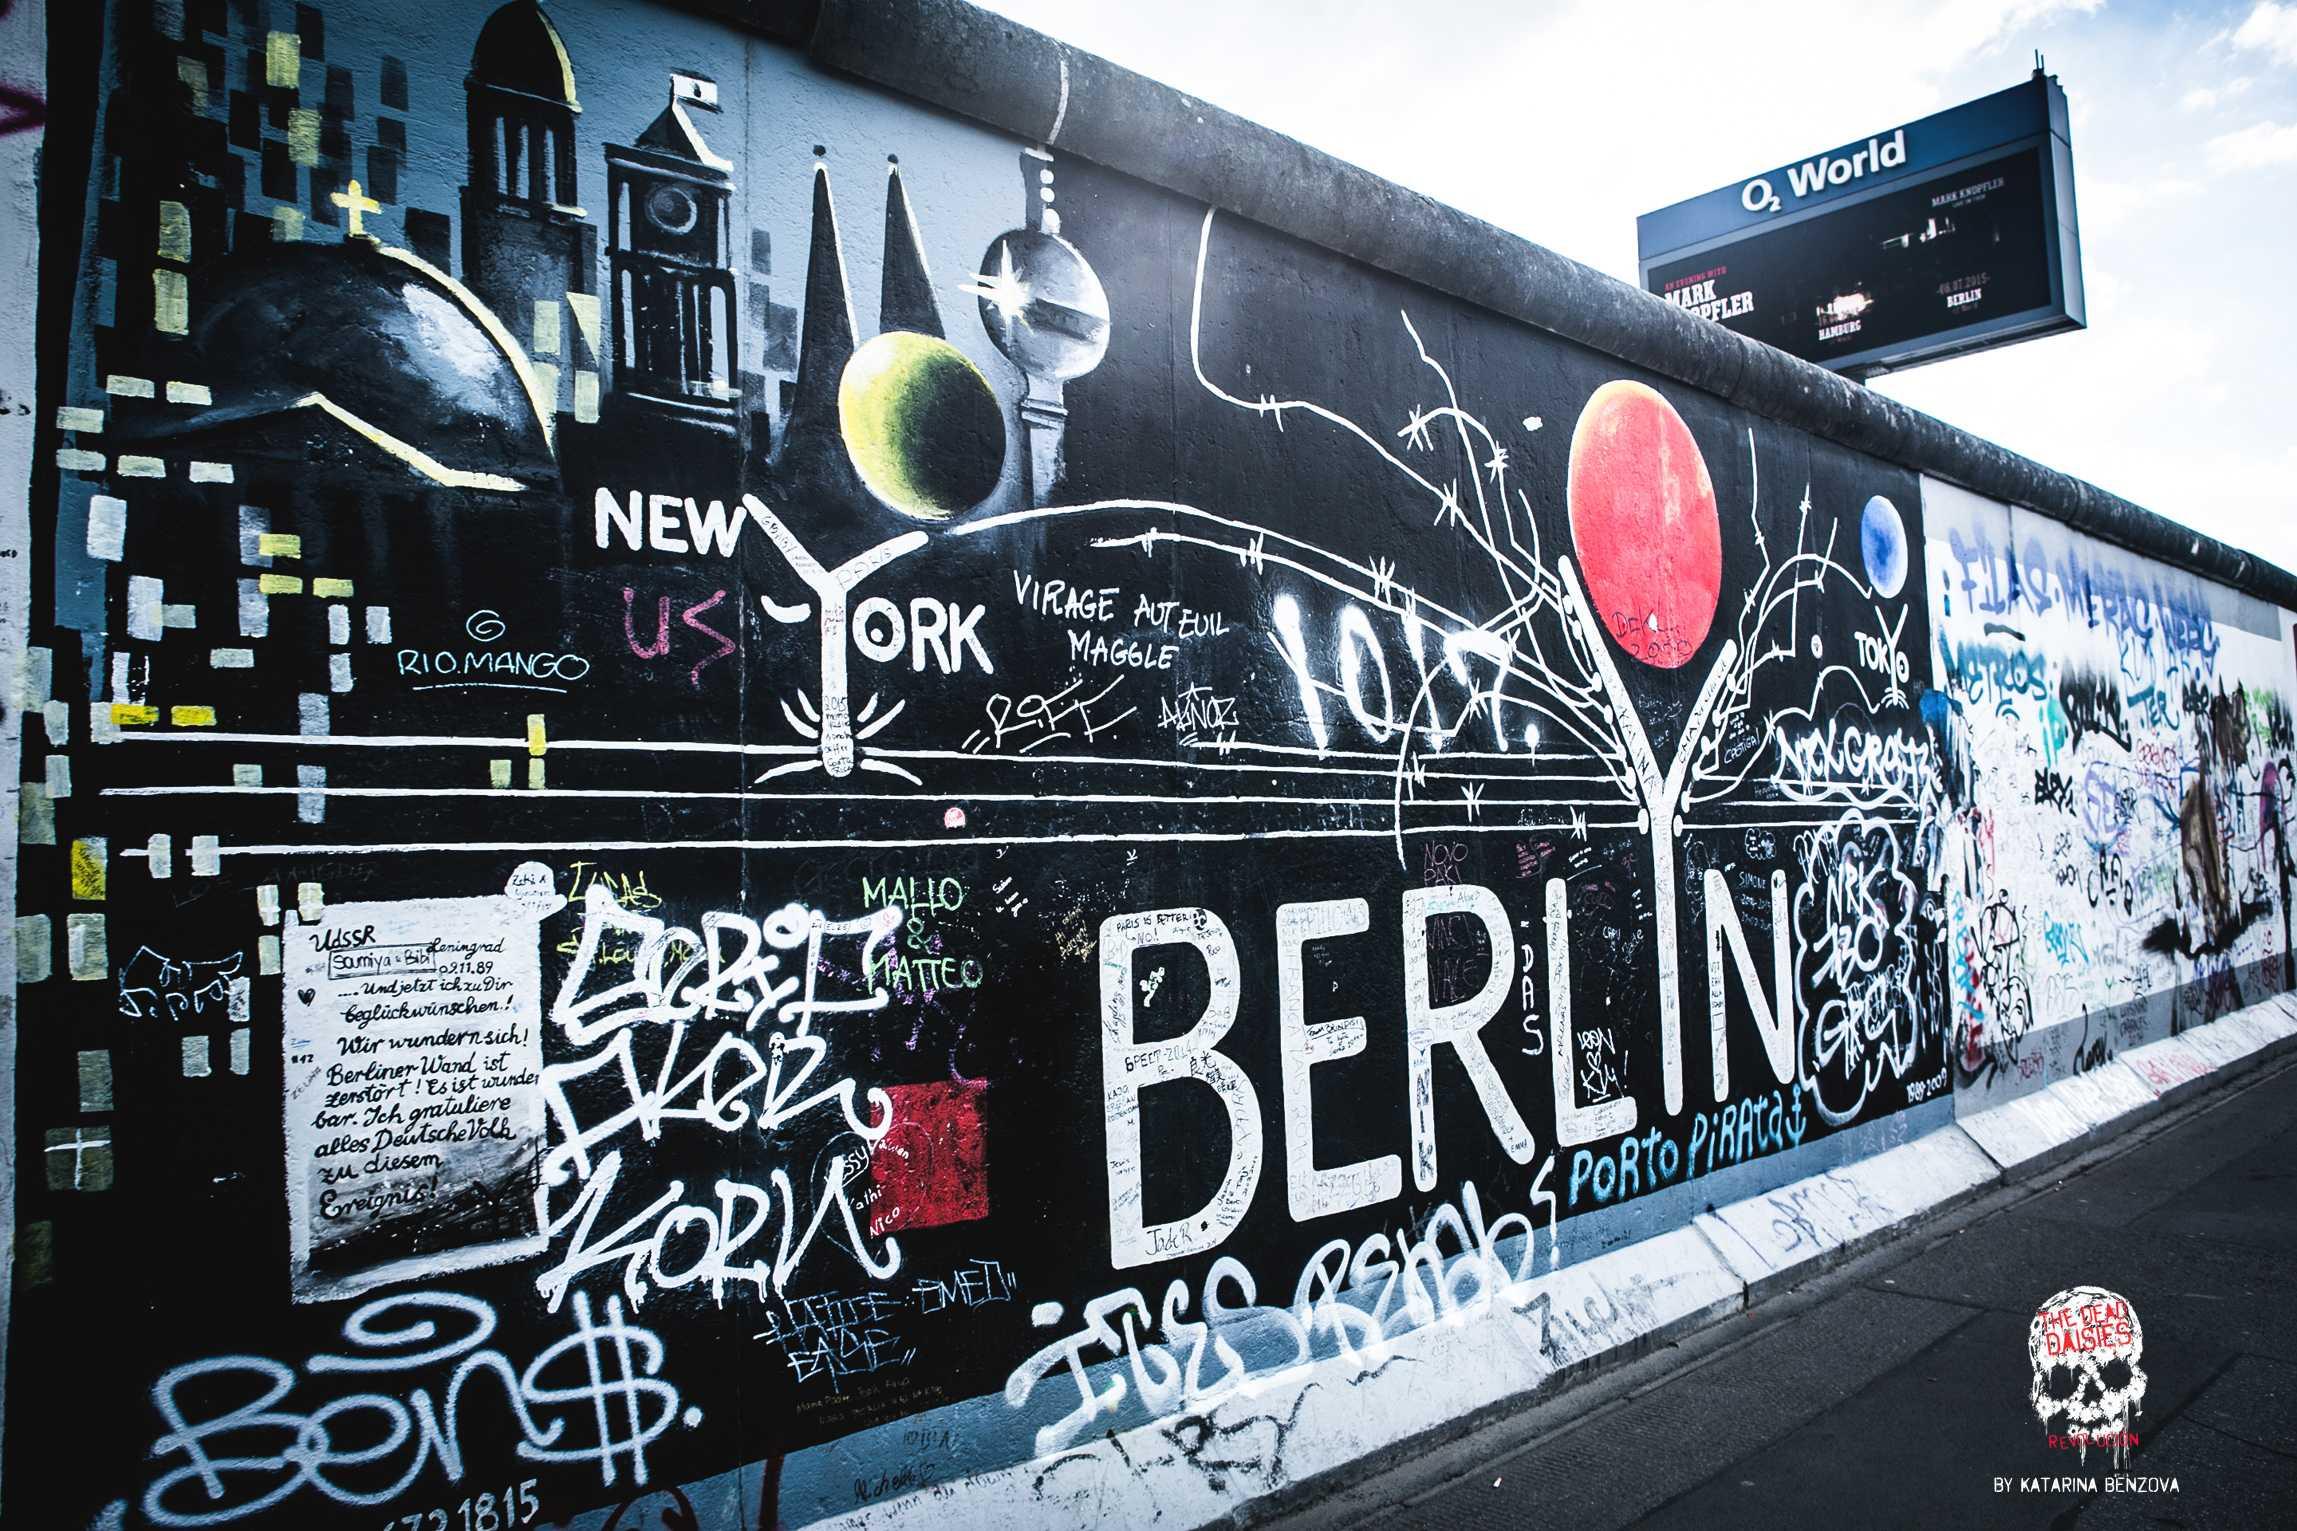 Day 6, O2 Berlin, Germany